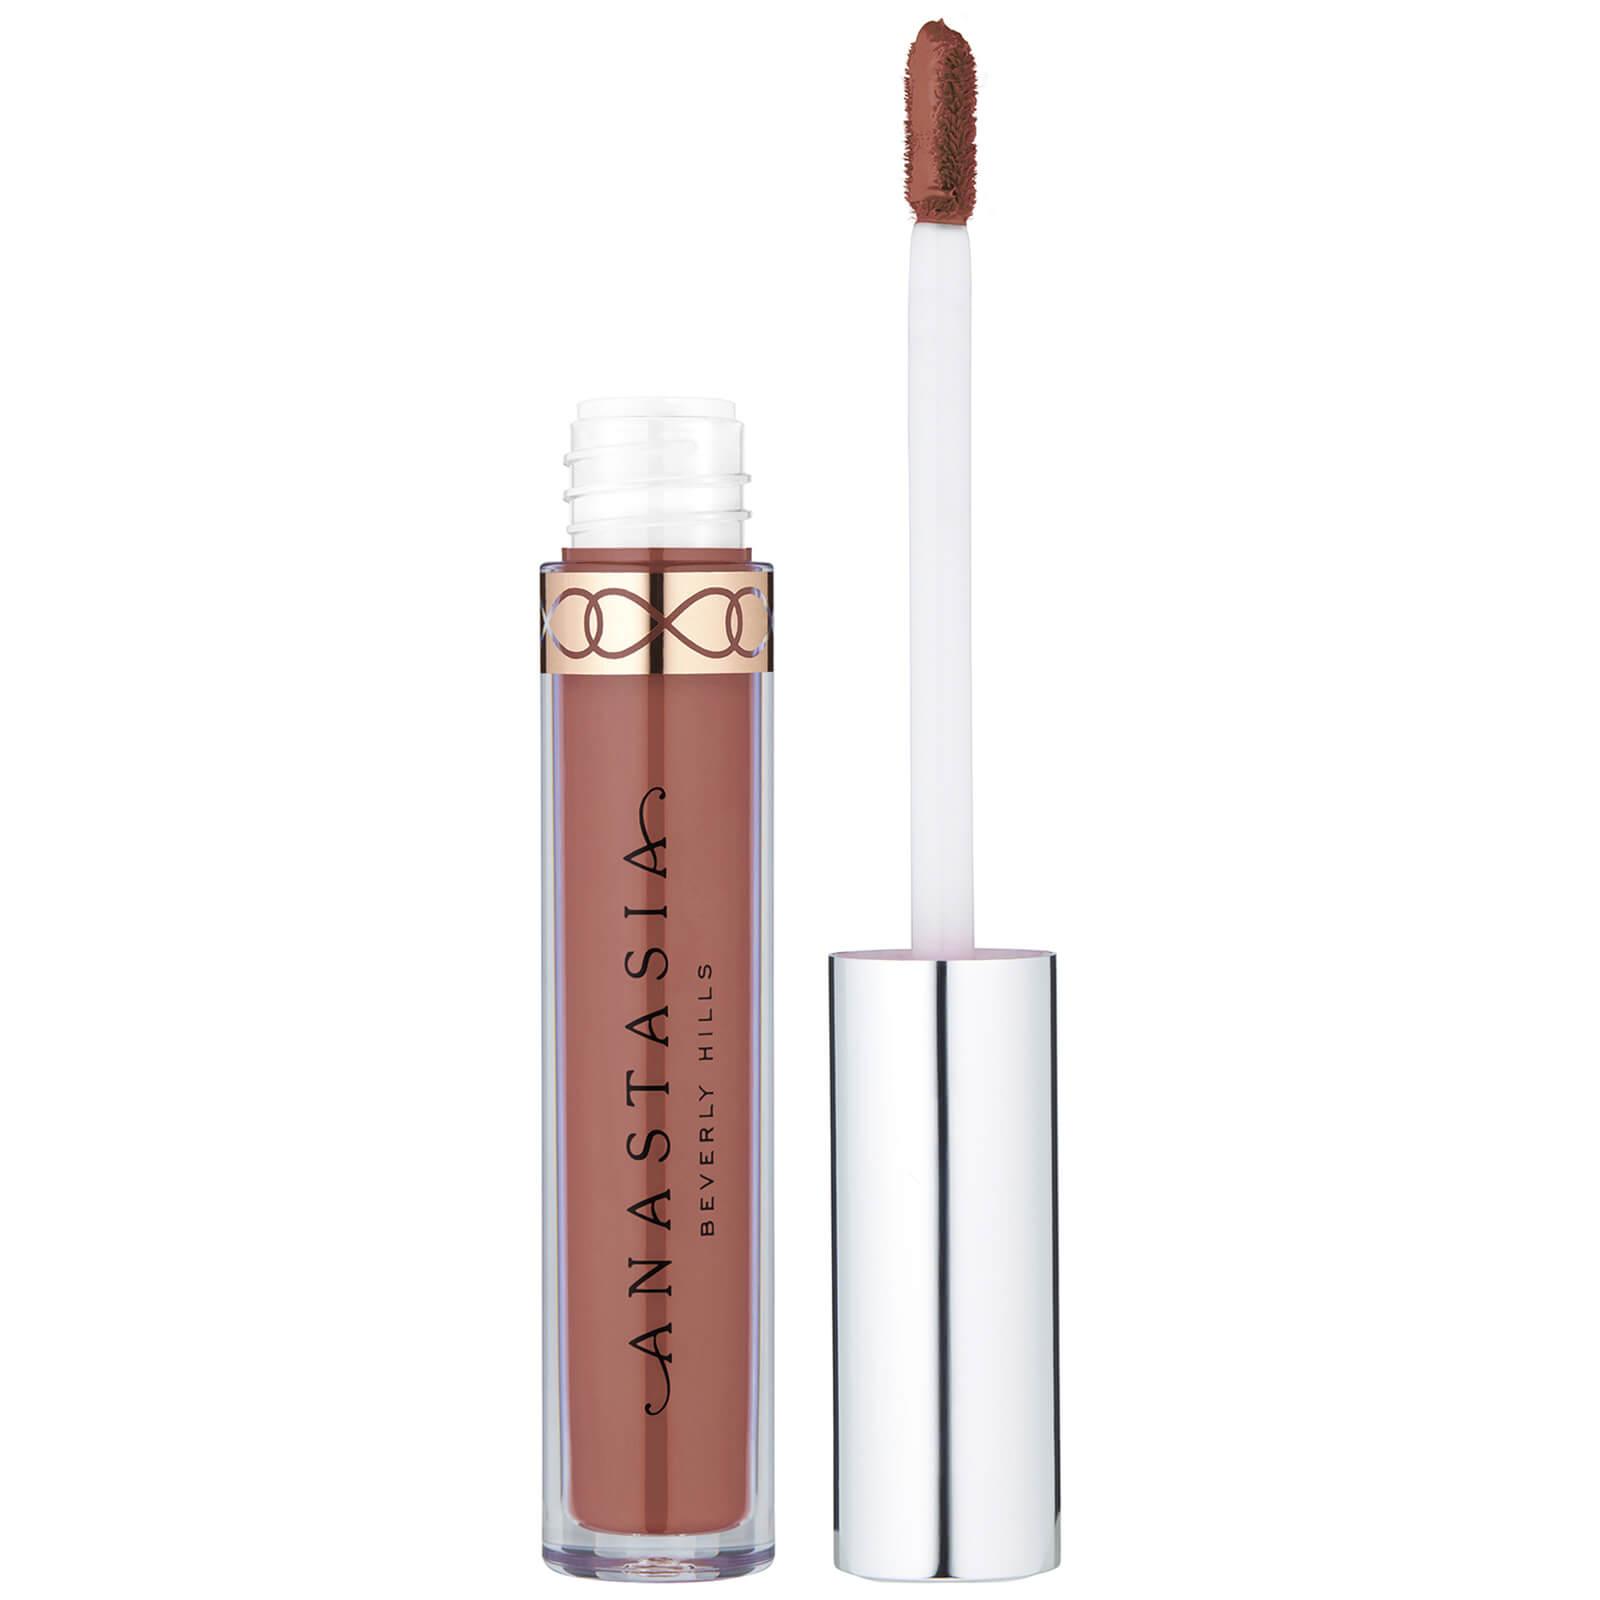 Anastasia Beverly Hills Liquid Lipstick 3.2g (Various Shades) - Stripped